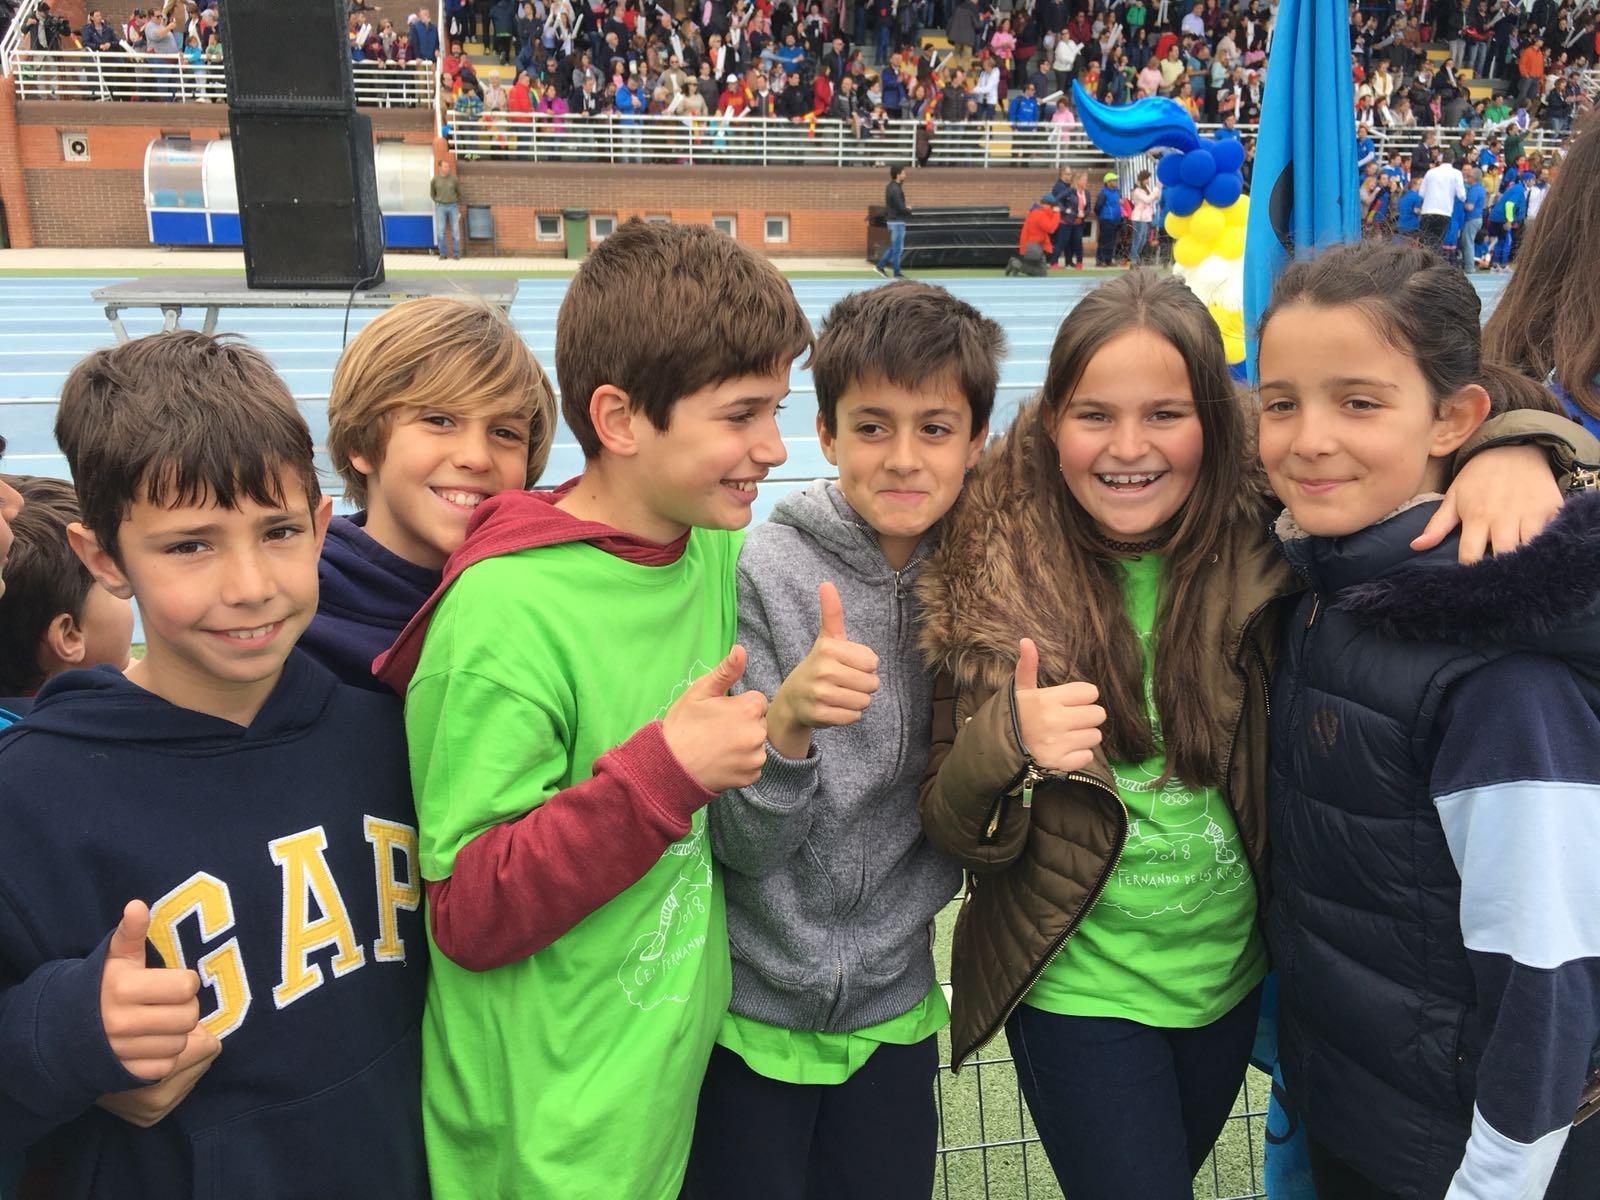 2018-04-09_Olimpiadas Escolares_CEIP FDLR_Las Rozas_Desfile 3